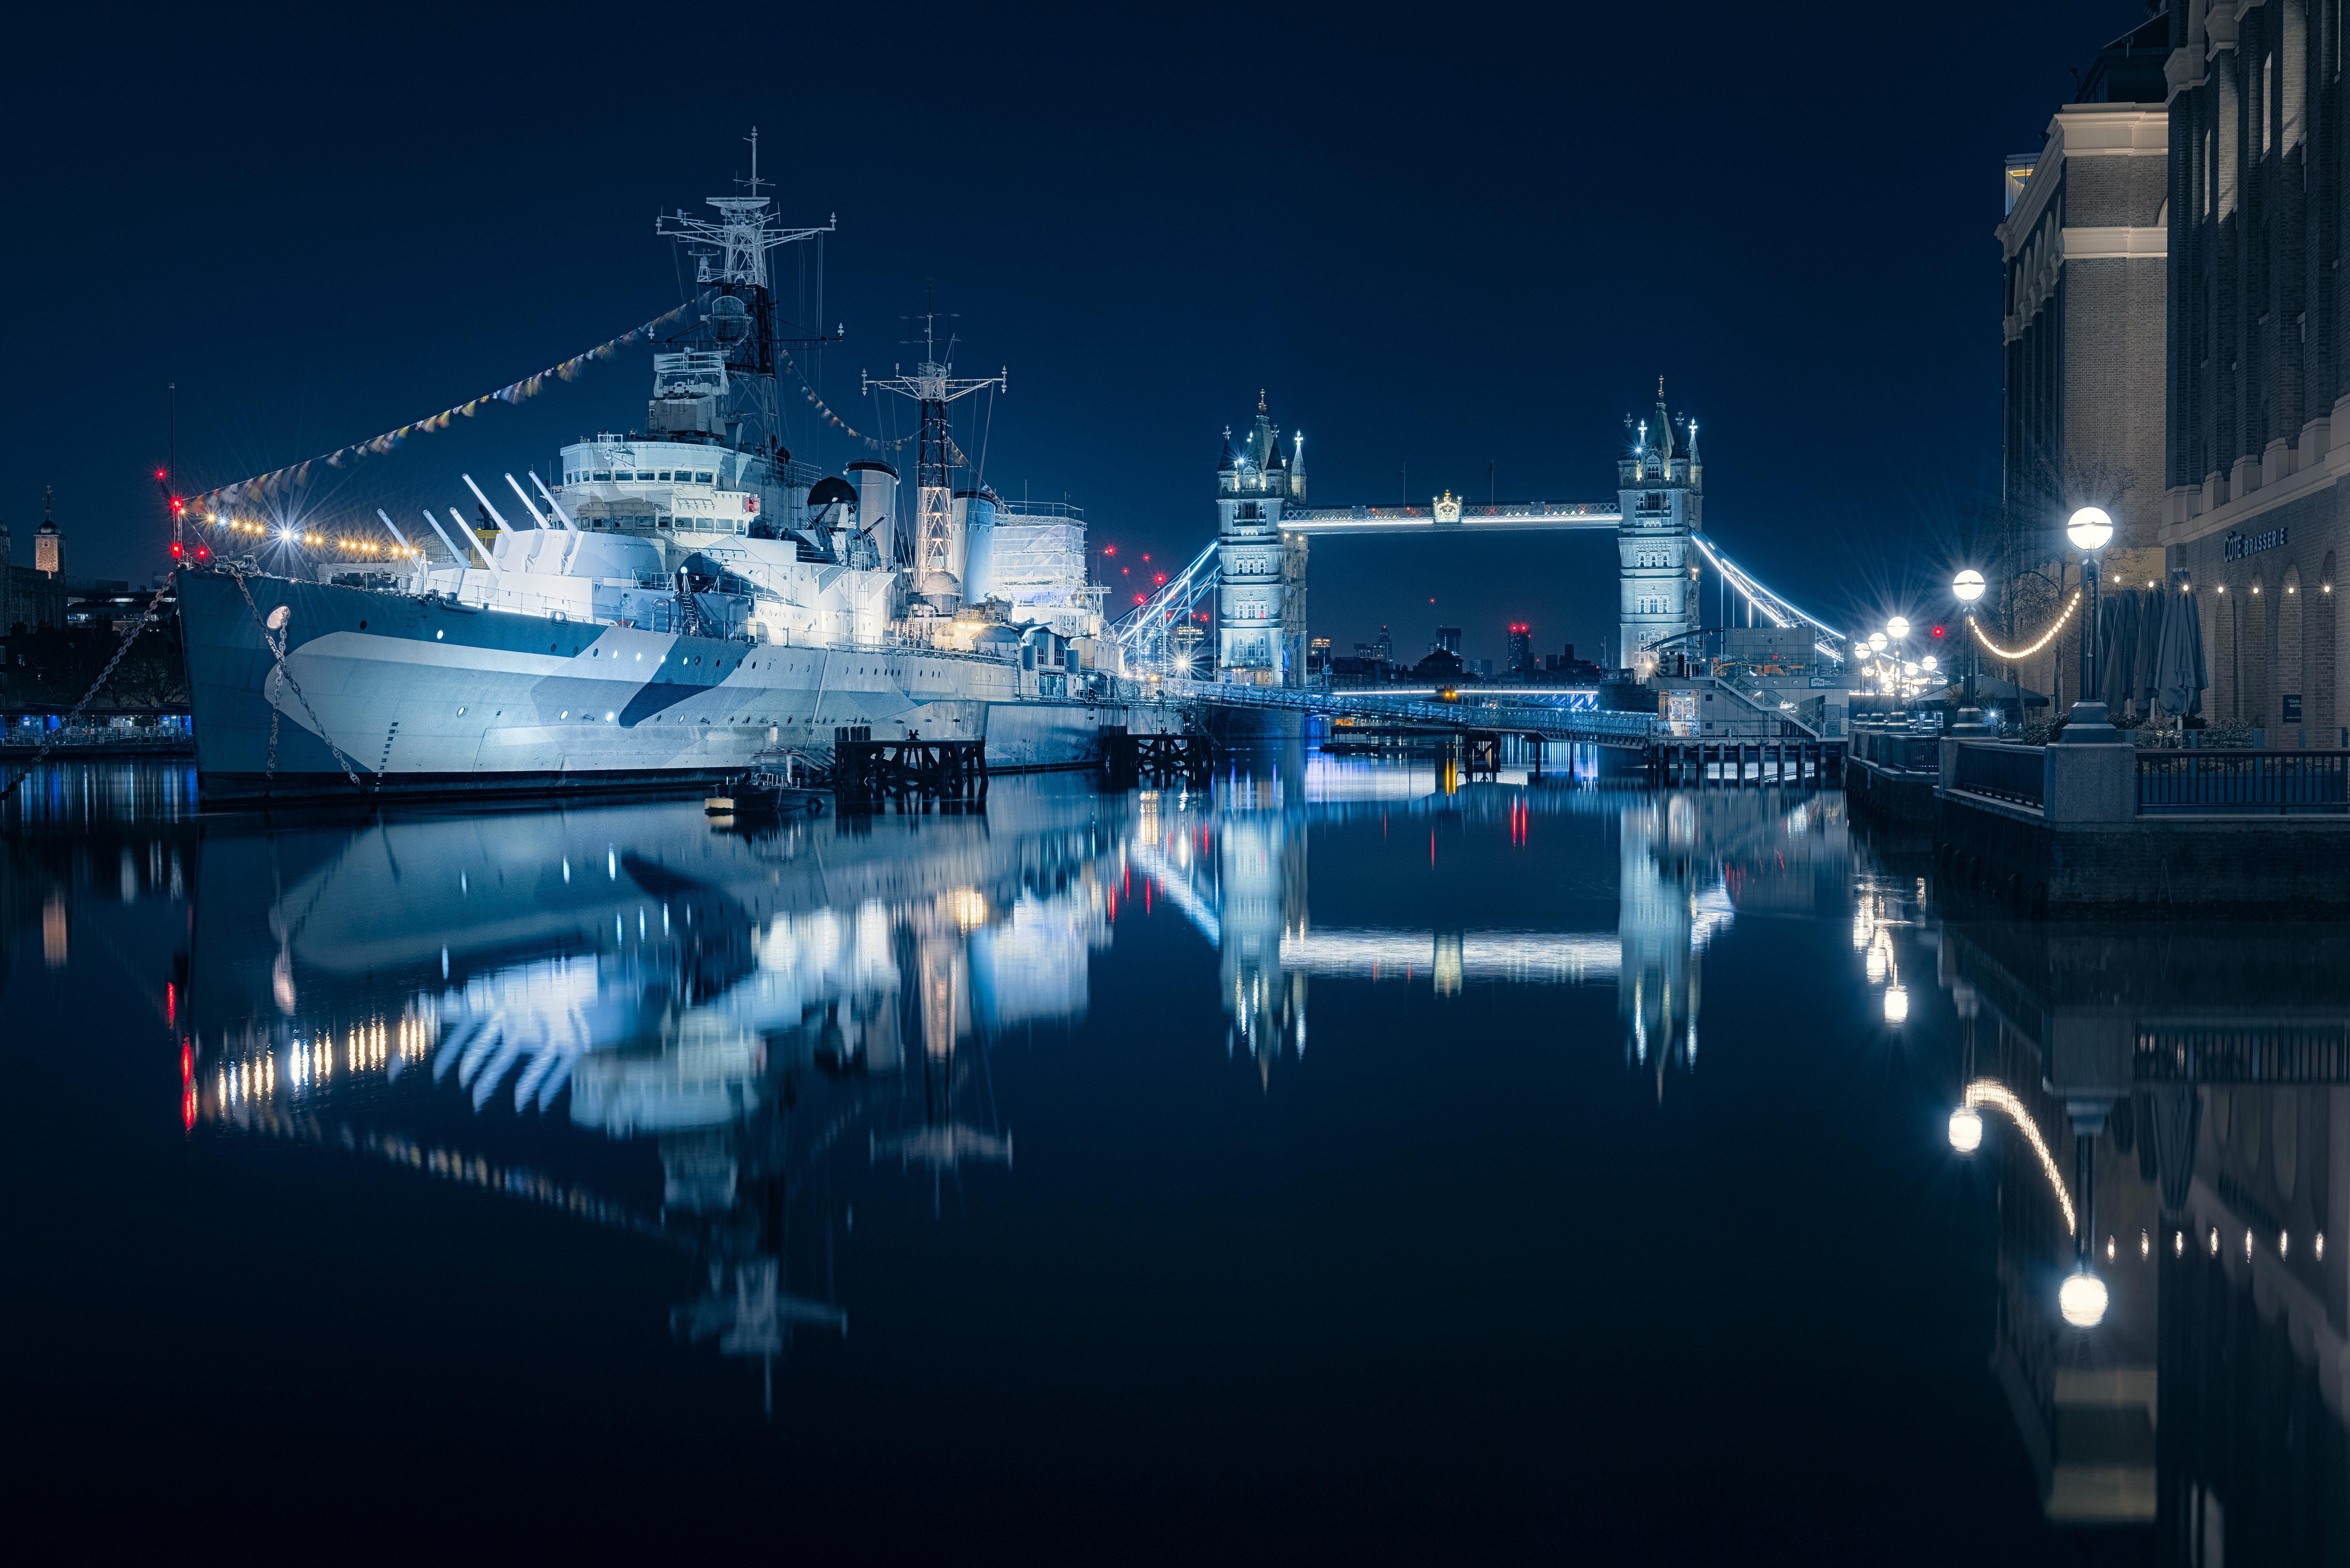 Tower Bridge 5k Retina Ultra HD Wallpaper Background Image 6885x4595